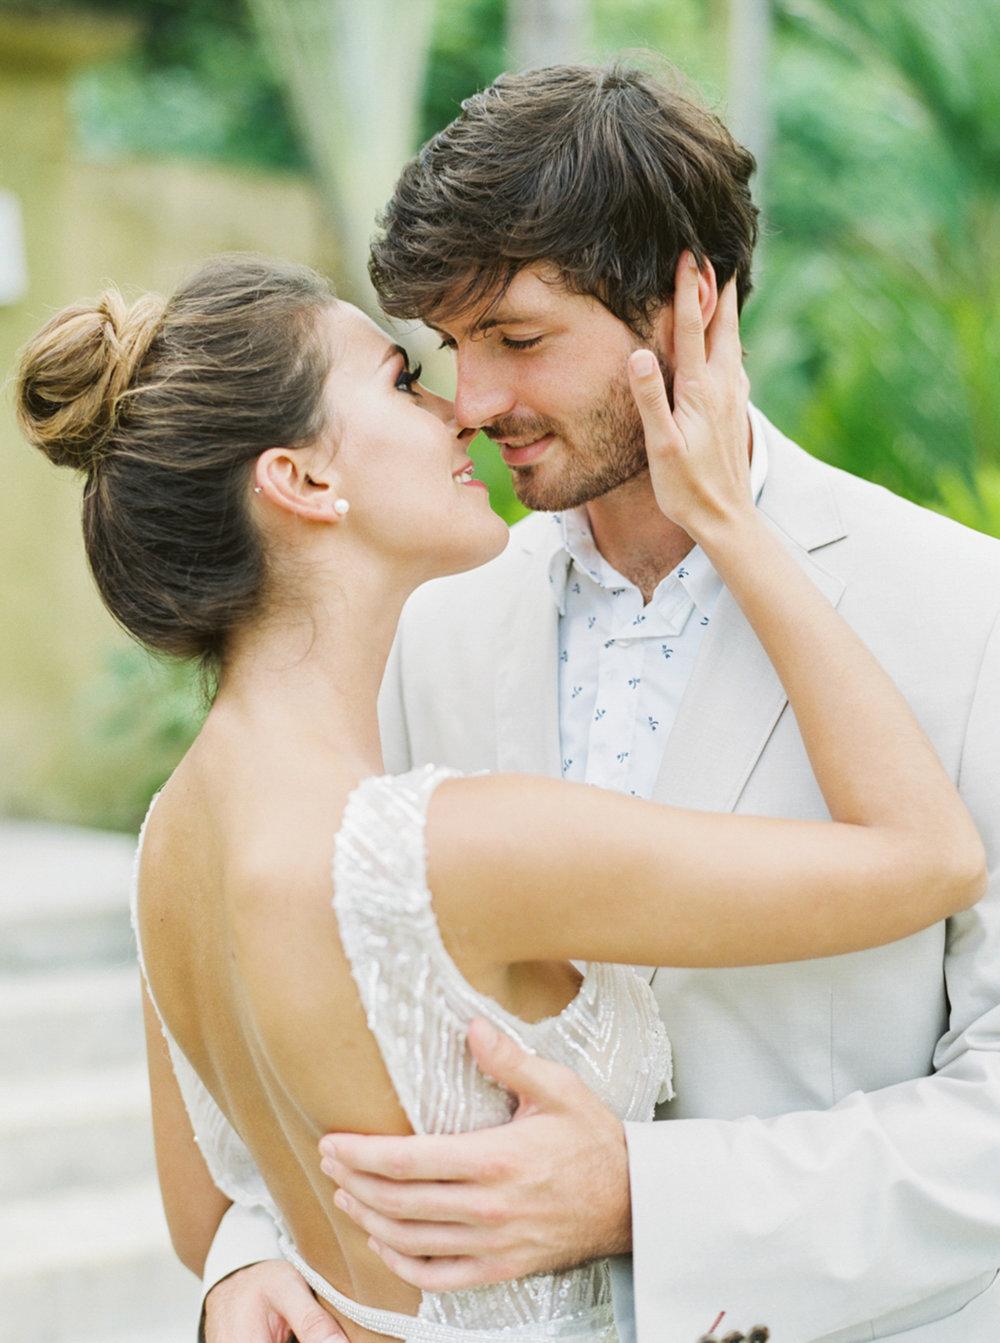 Thailand wedding photographer Sheri McMahon